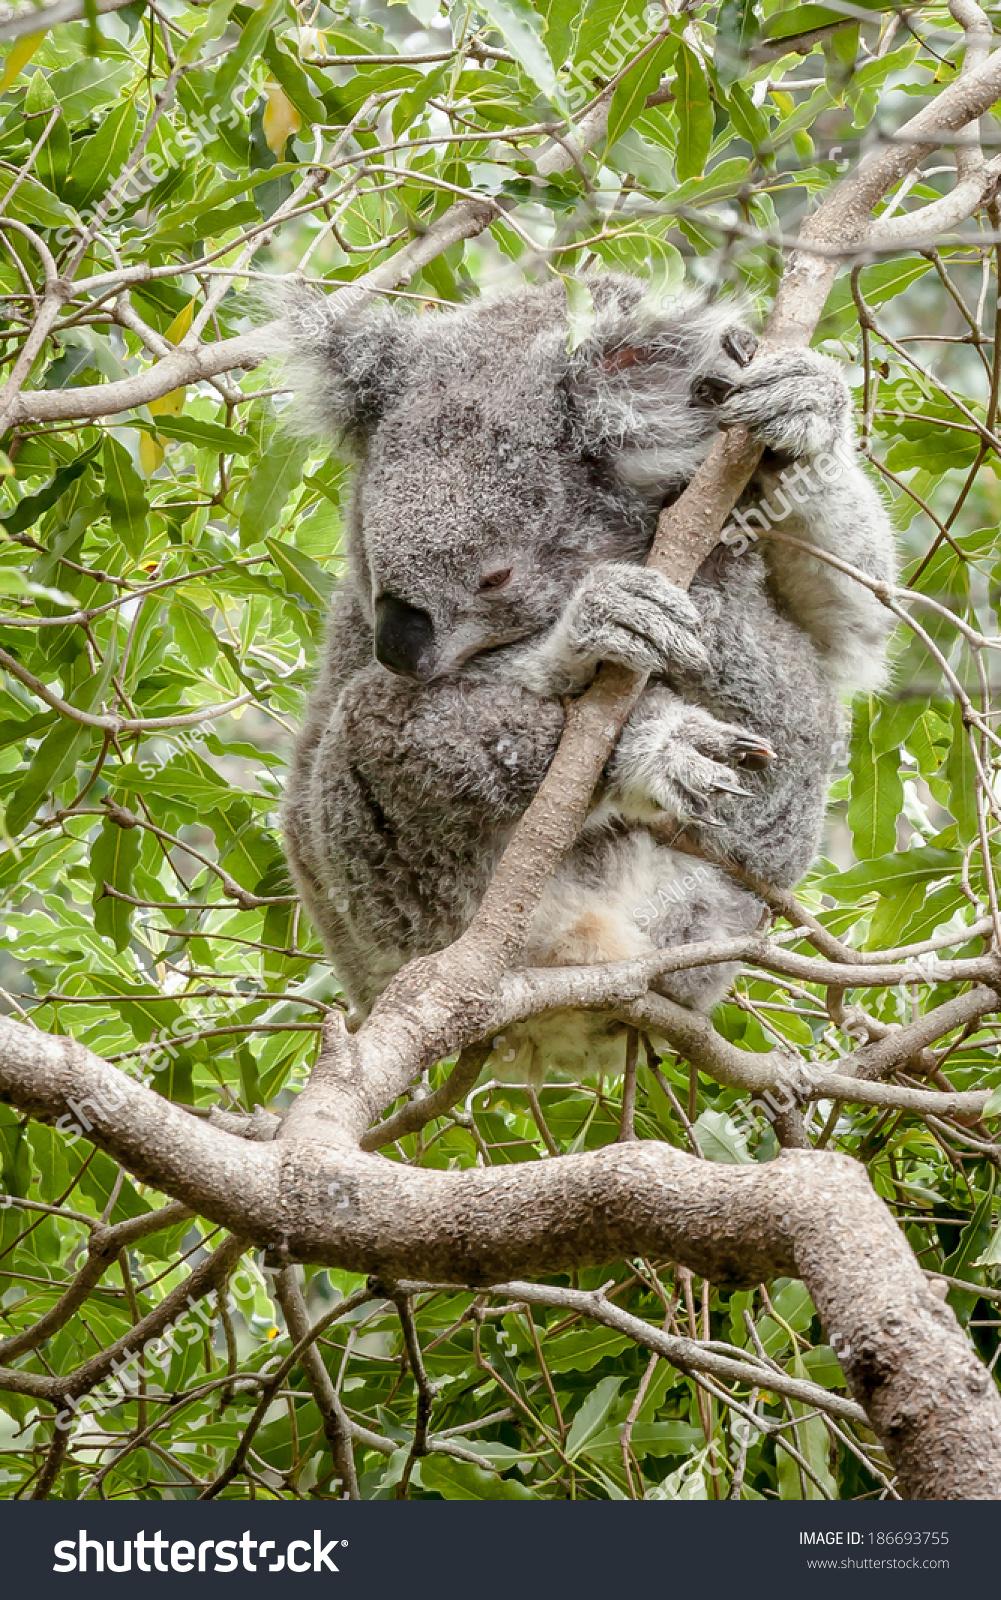 Australian Koala Phascolarctos Cinereus Wet Rain Stock Photo Edit Now 186693755